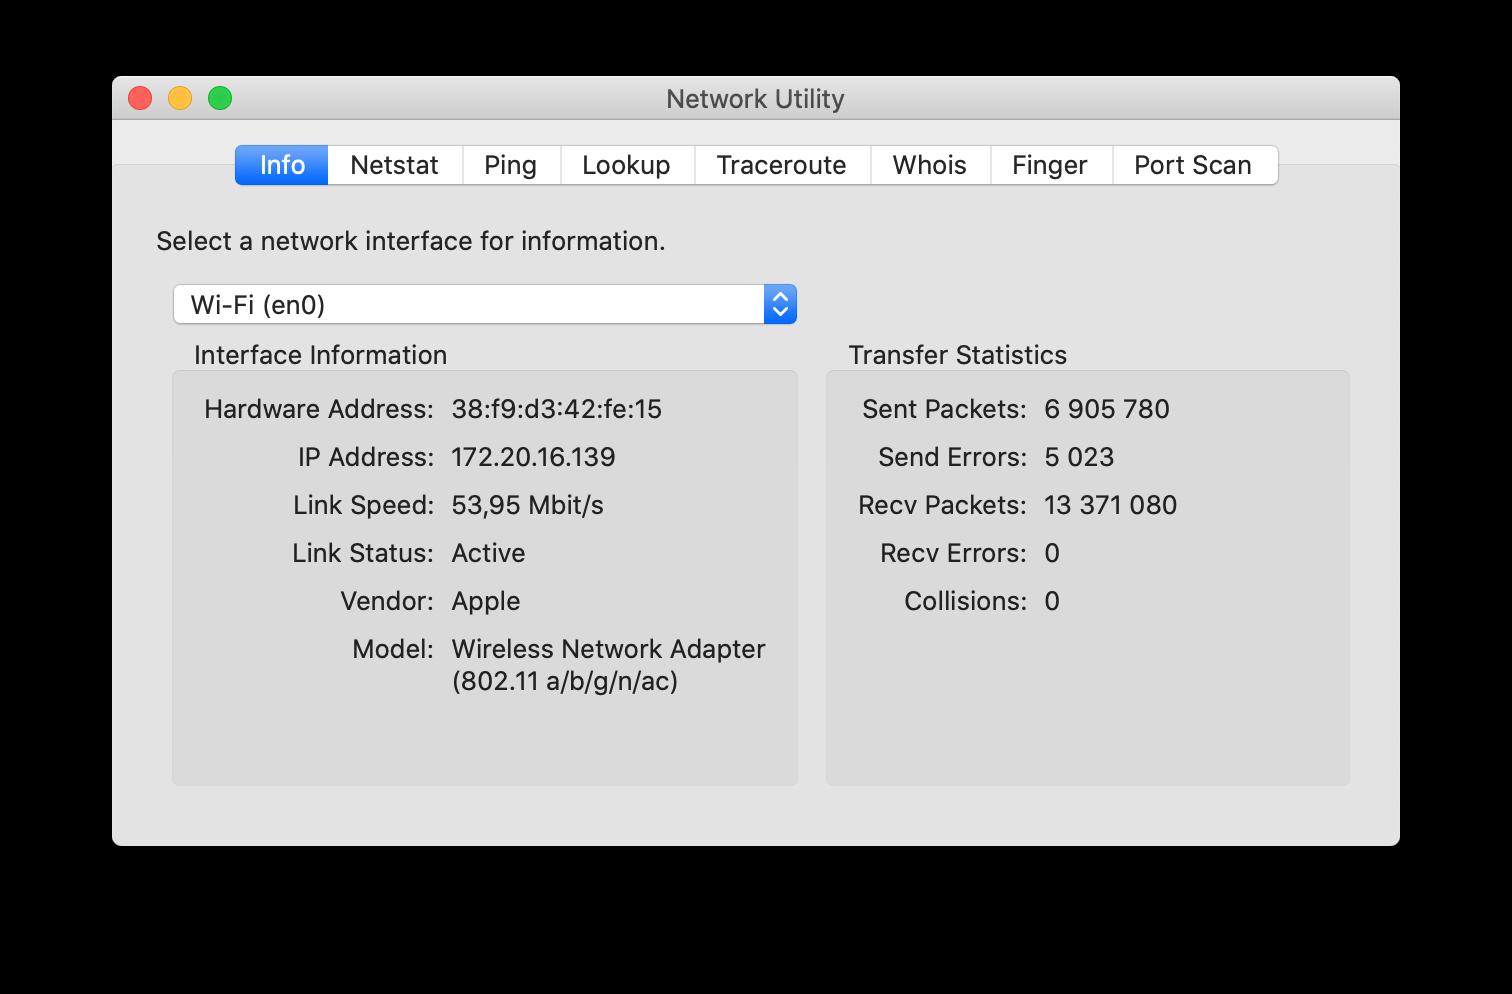 Network utility